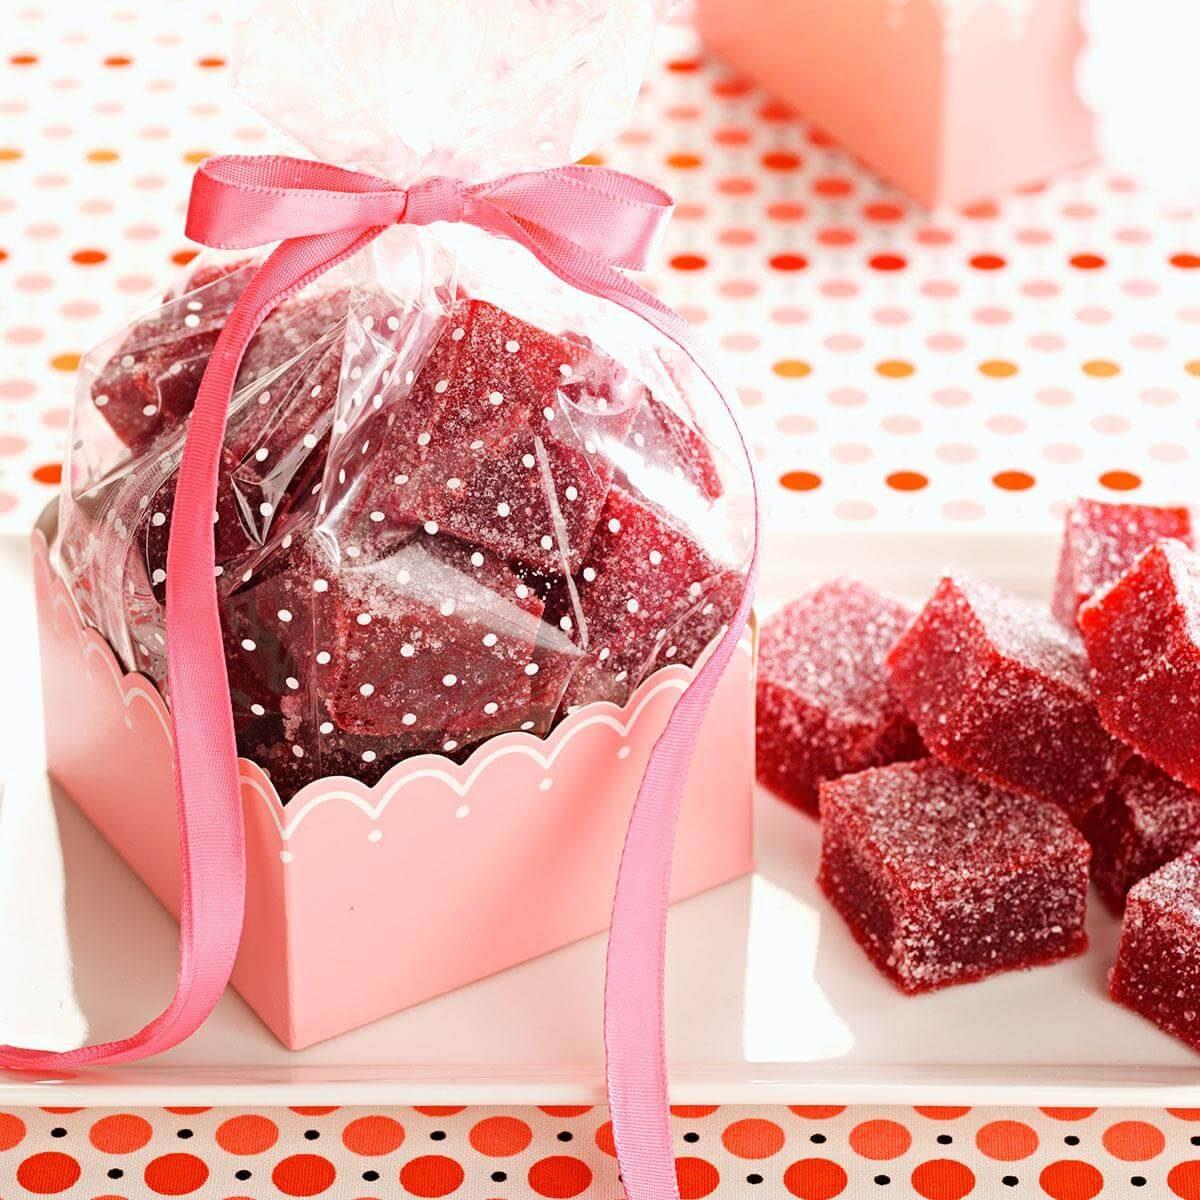 Cranberry Gumdrops Recipe | Taste of Home